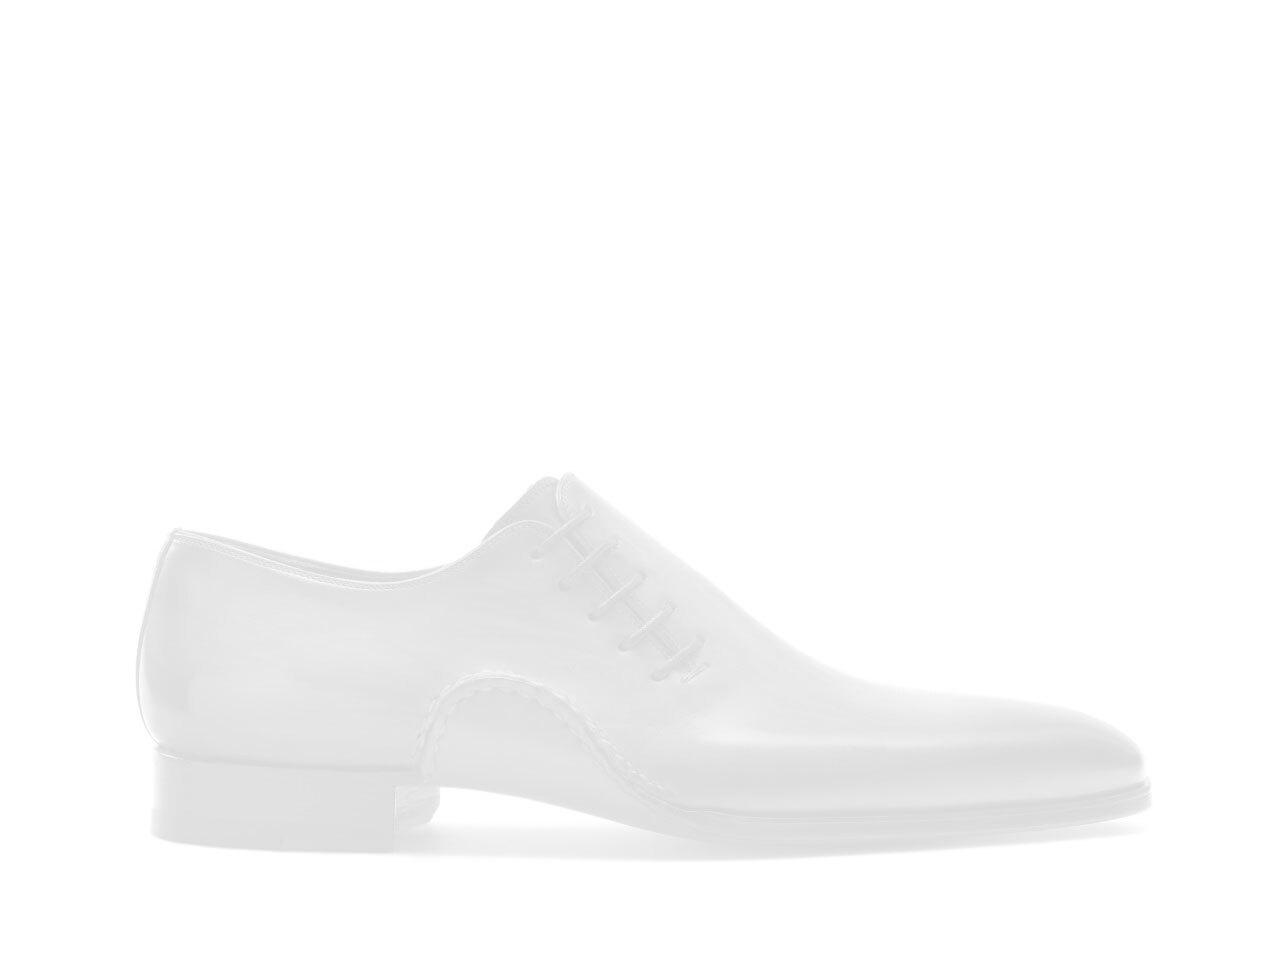 Pair of the Magnanni Romelo Black Men's Comfort Dress Shoes